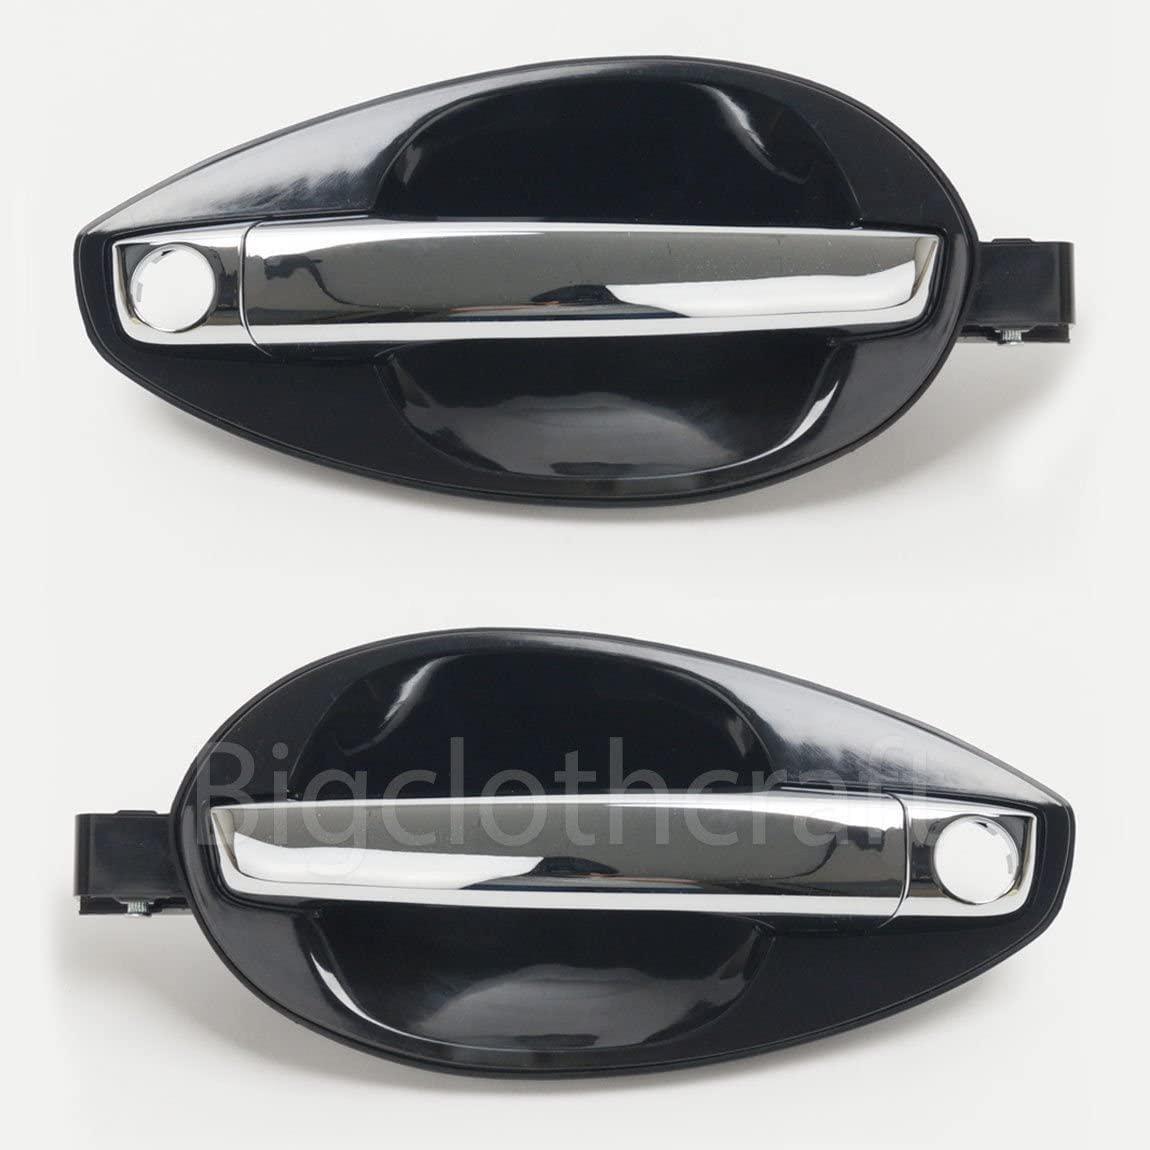 Genuine Outside Chrome Door Handle Catch (unpainted) LH & RH Set For 2003-2008 Hyundai Tiburon Coupe (826502C010 & 826602C010) Left (Driver) & Right (Passenger) side